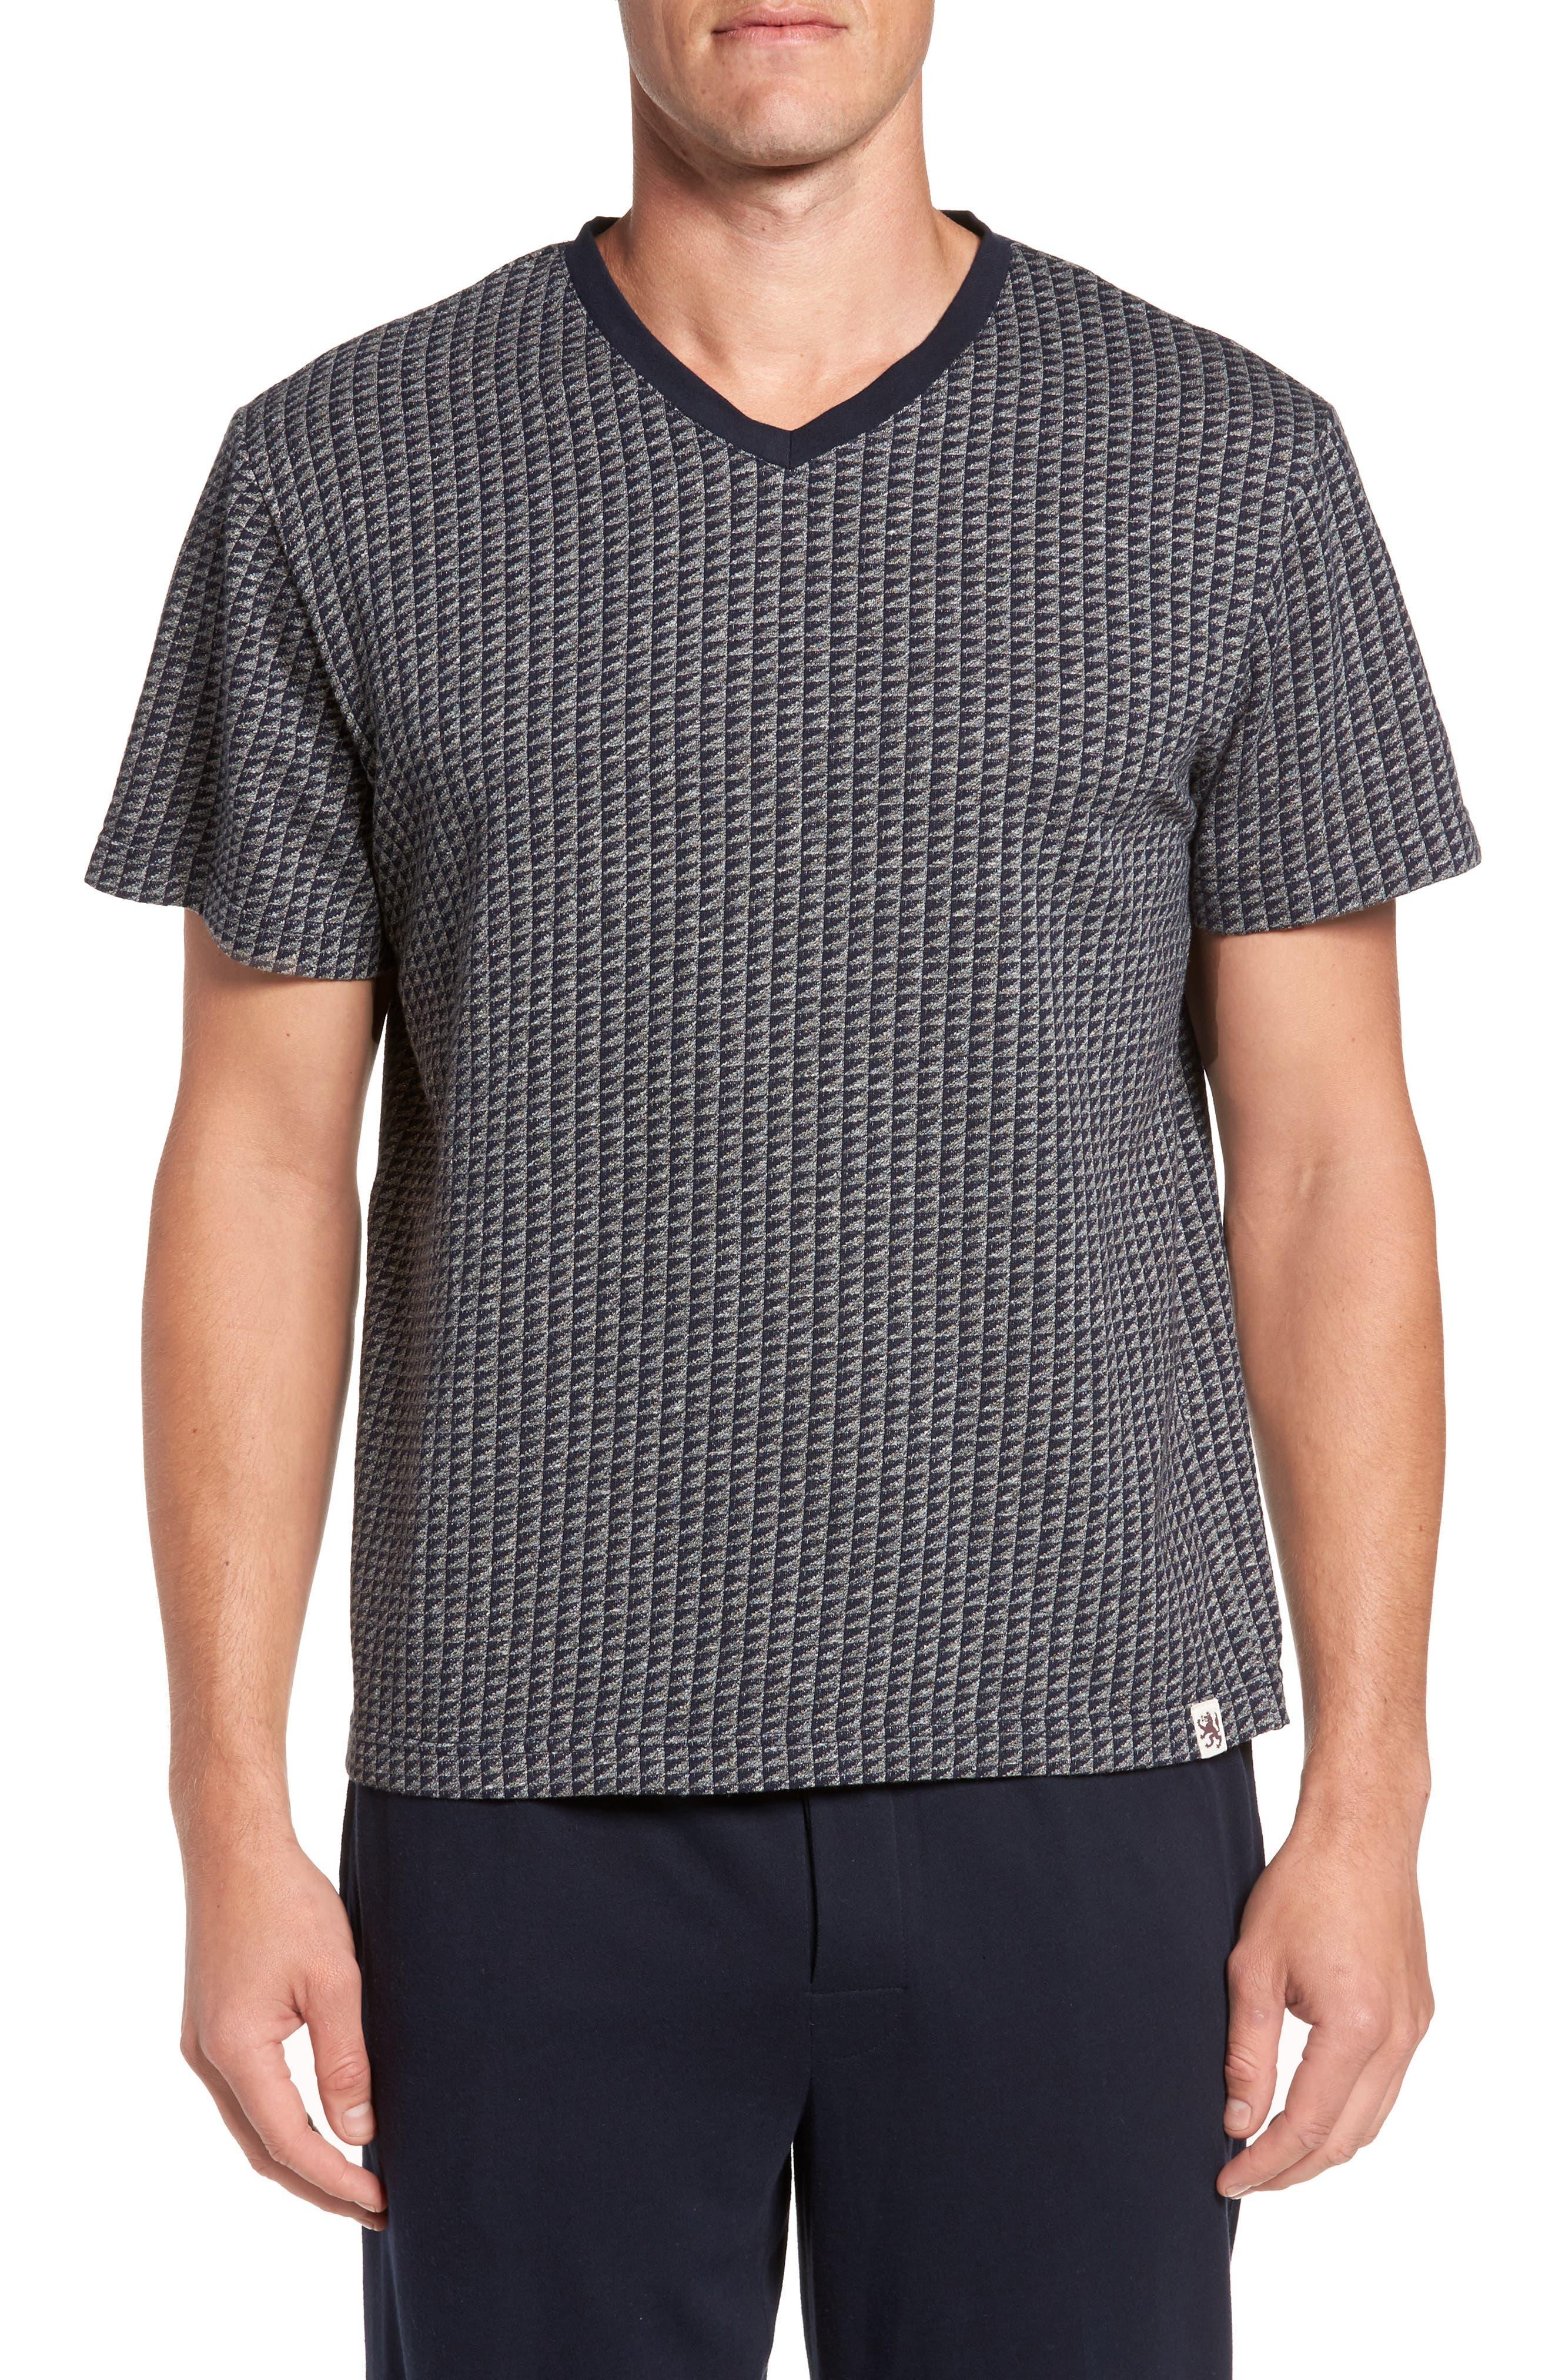 Trey V-Neck T-Shirt,                             Main thumbnail 1, color,                             030